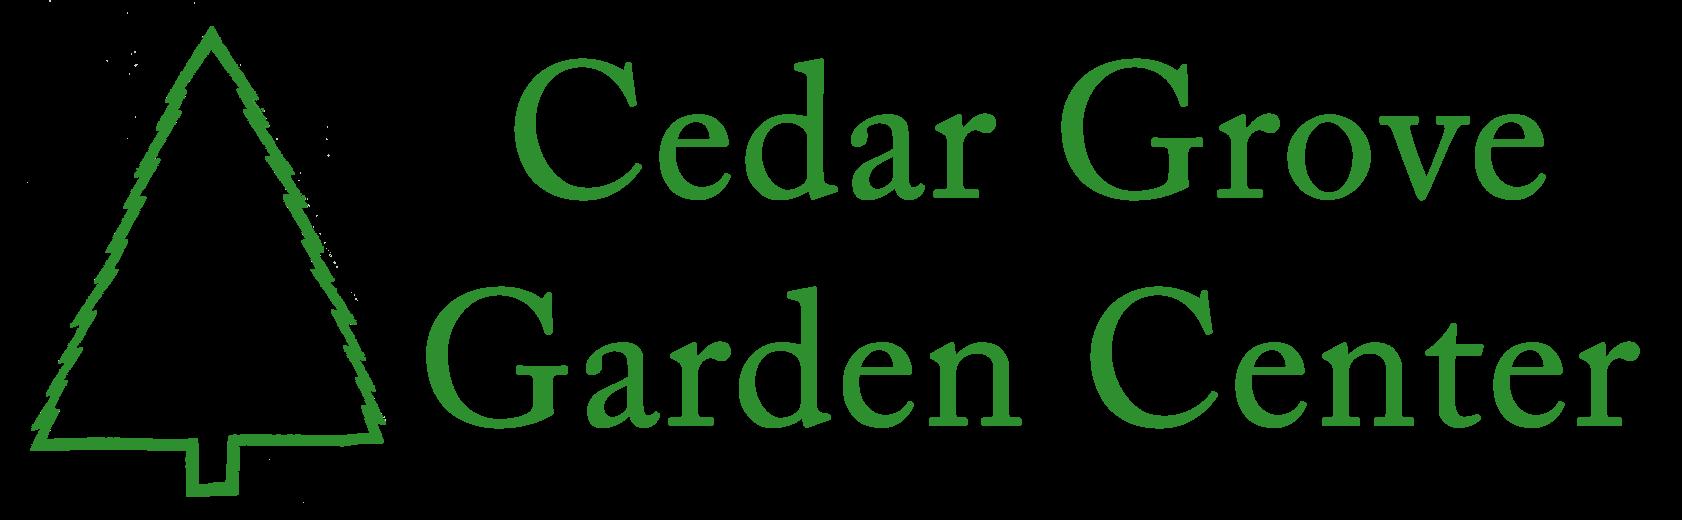 Nice Logo Logo Logo Logo